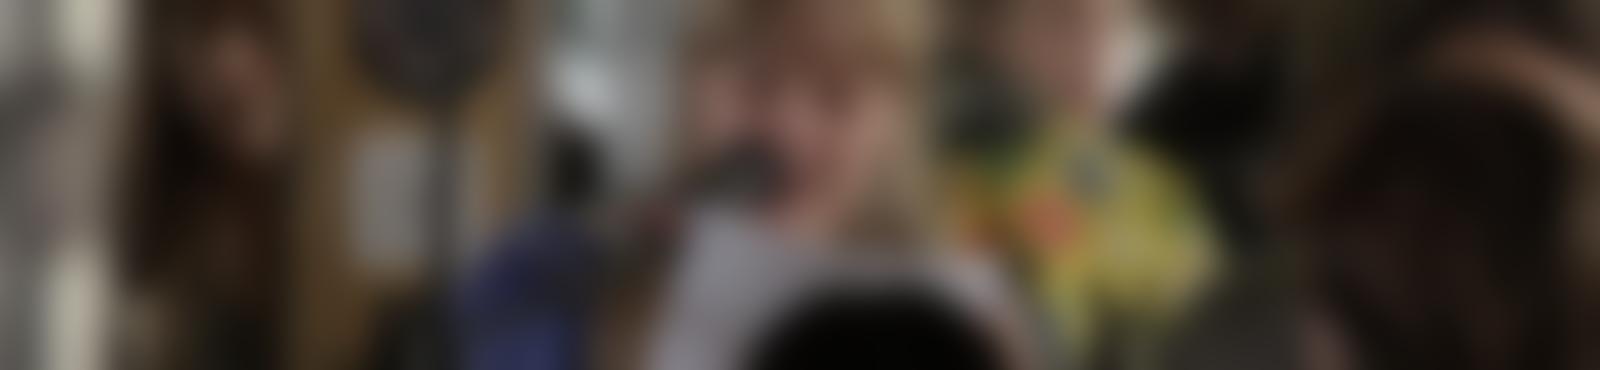 Blurred 96ace013 f32d 438e 95d3 86337c040b76